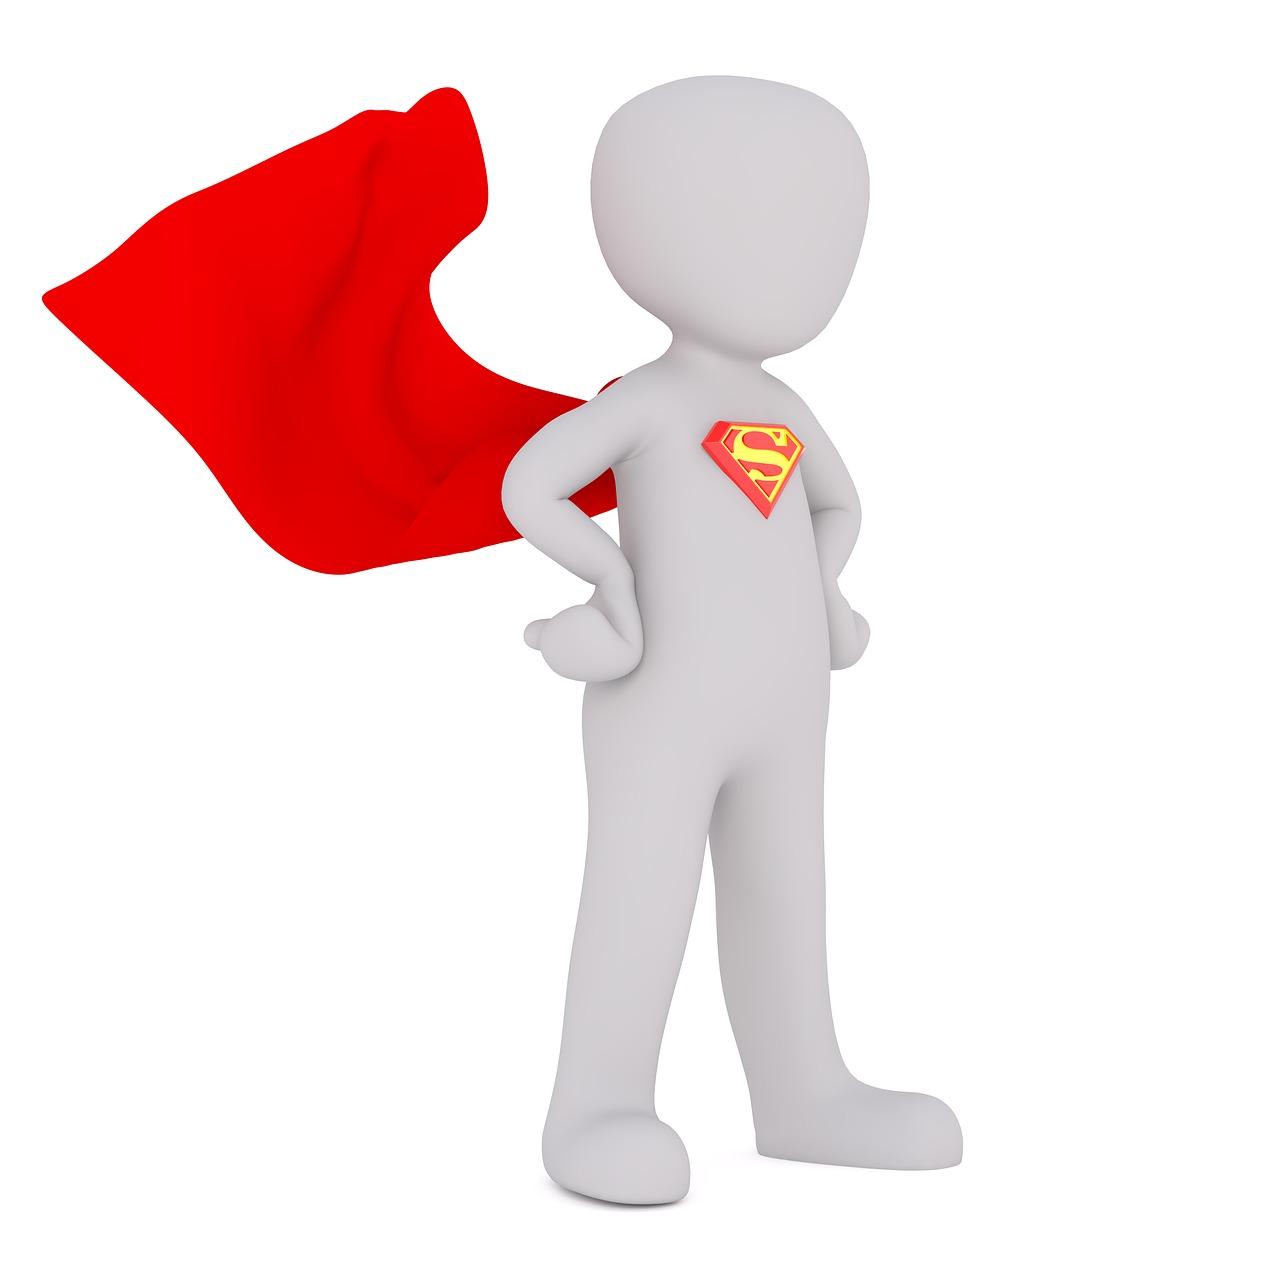 superman-1825720_1280